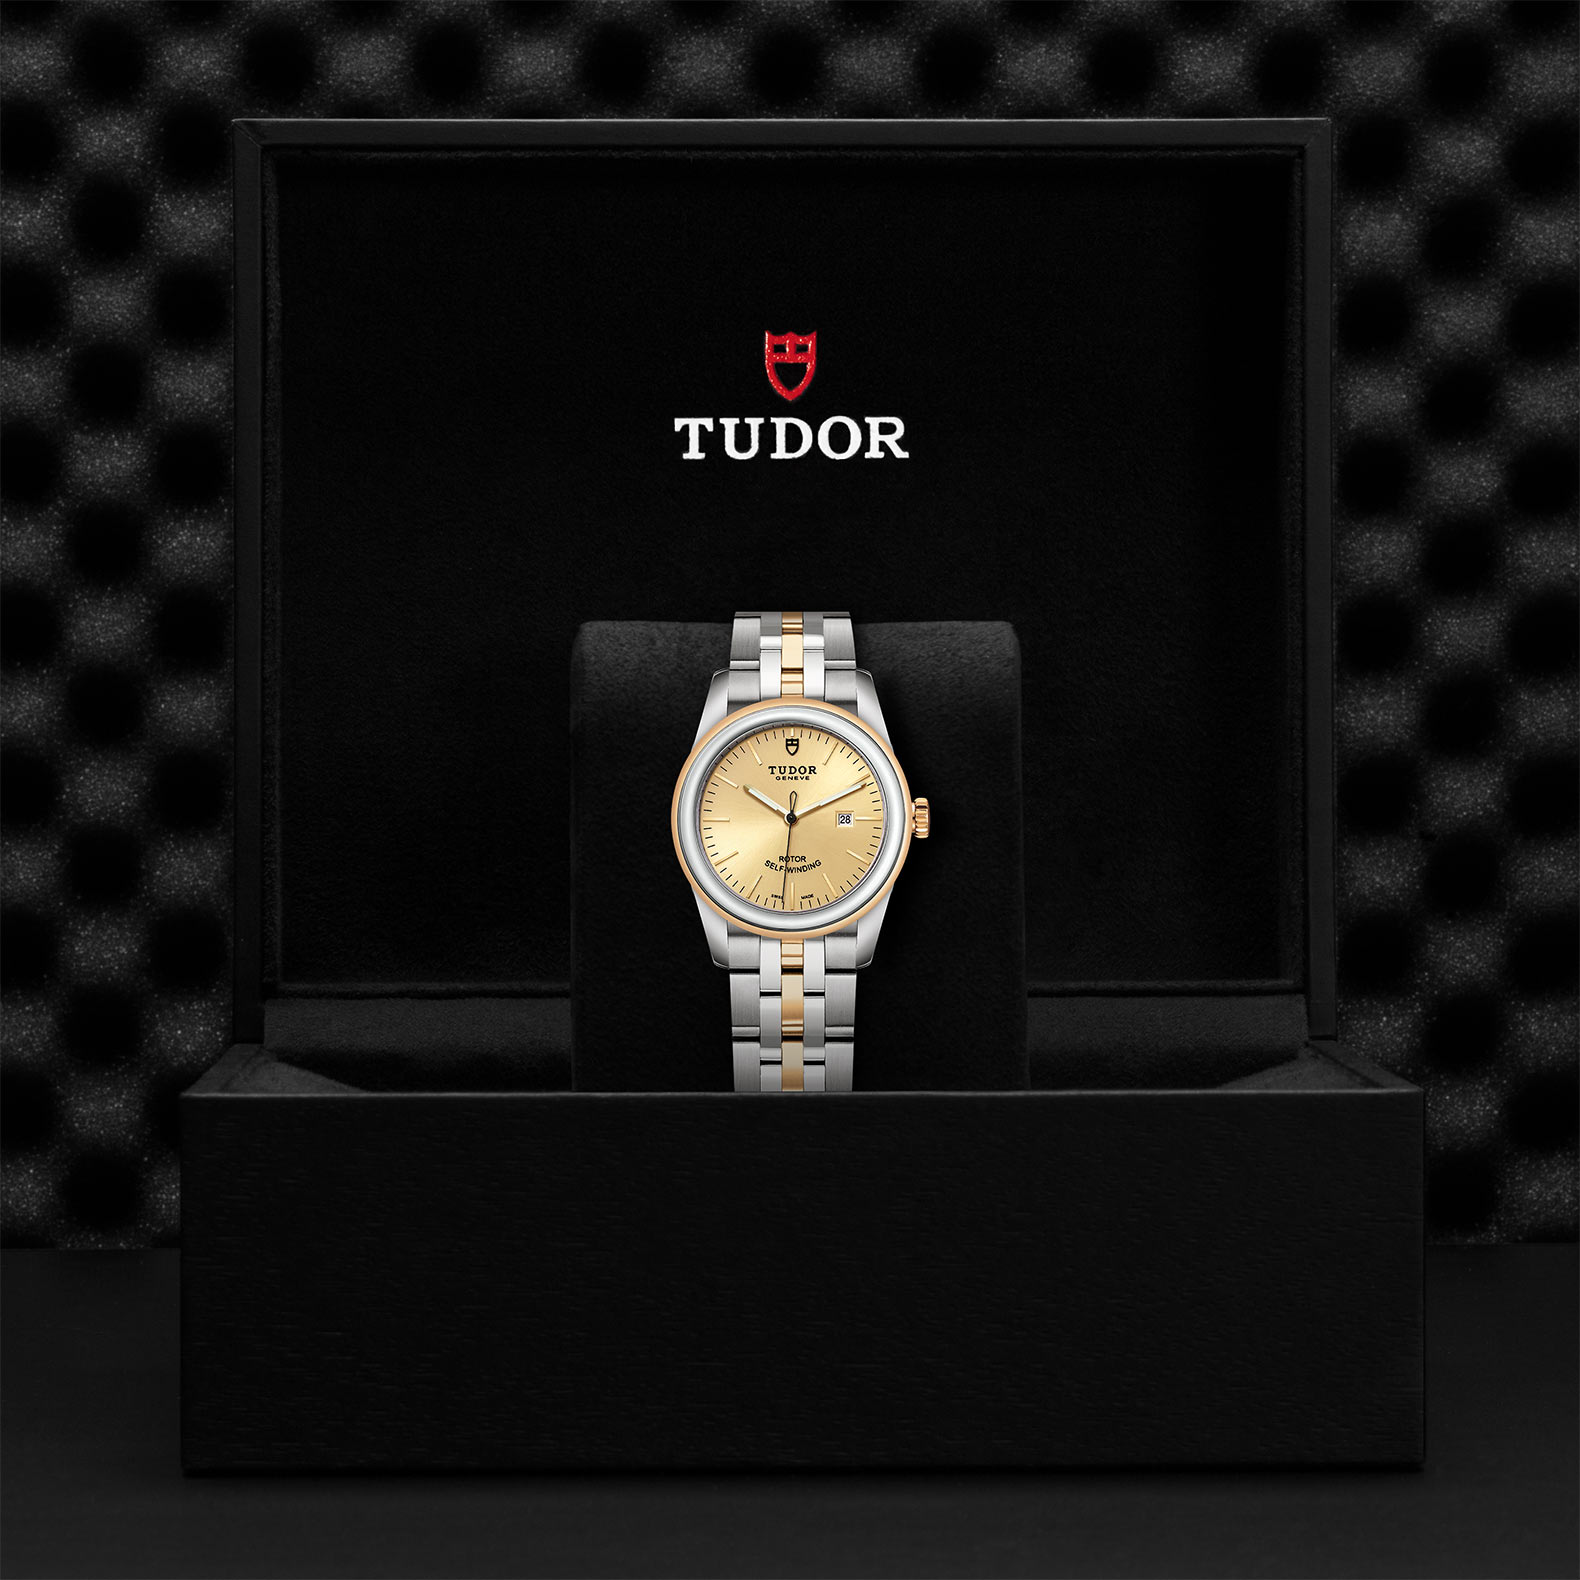 TUDOR Glamour Date - M53003-0005